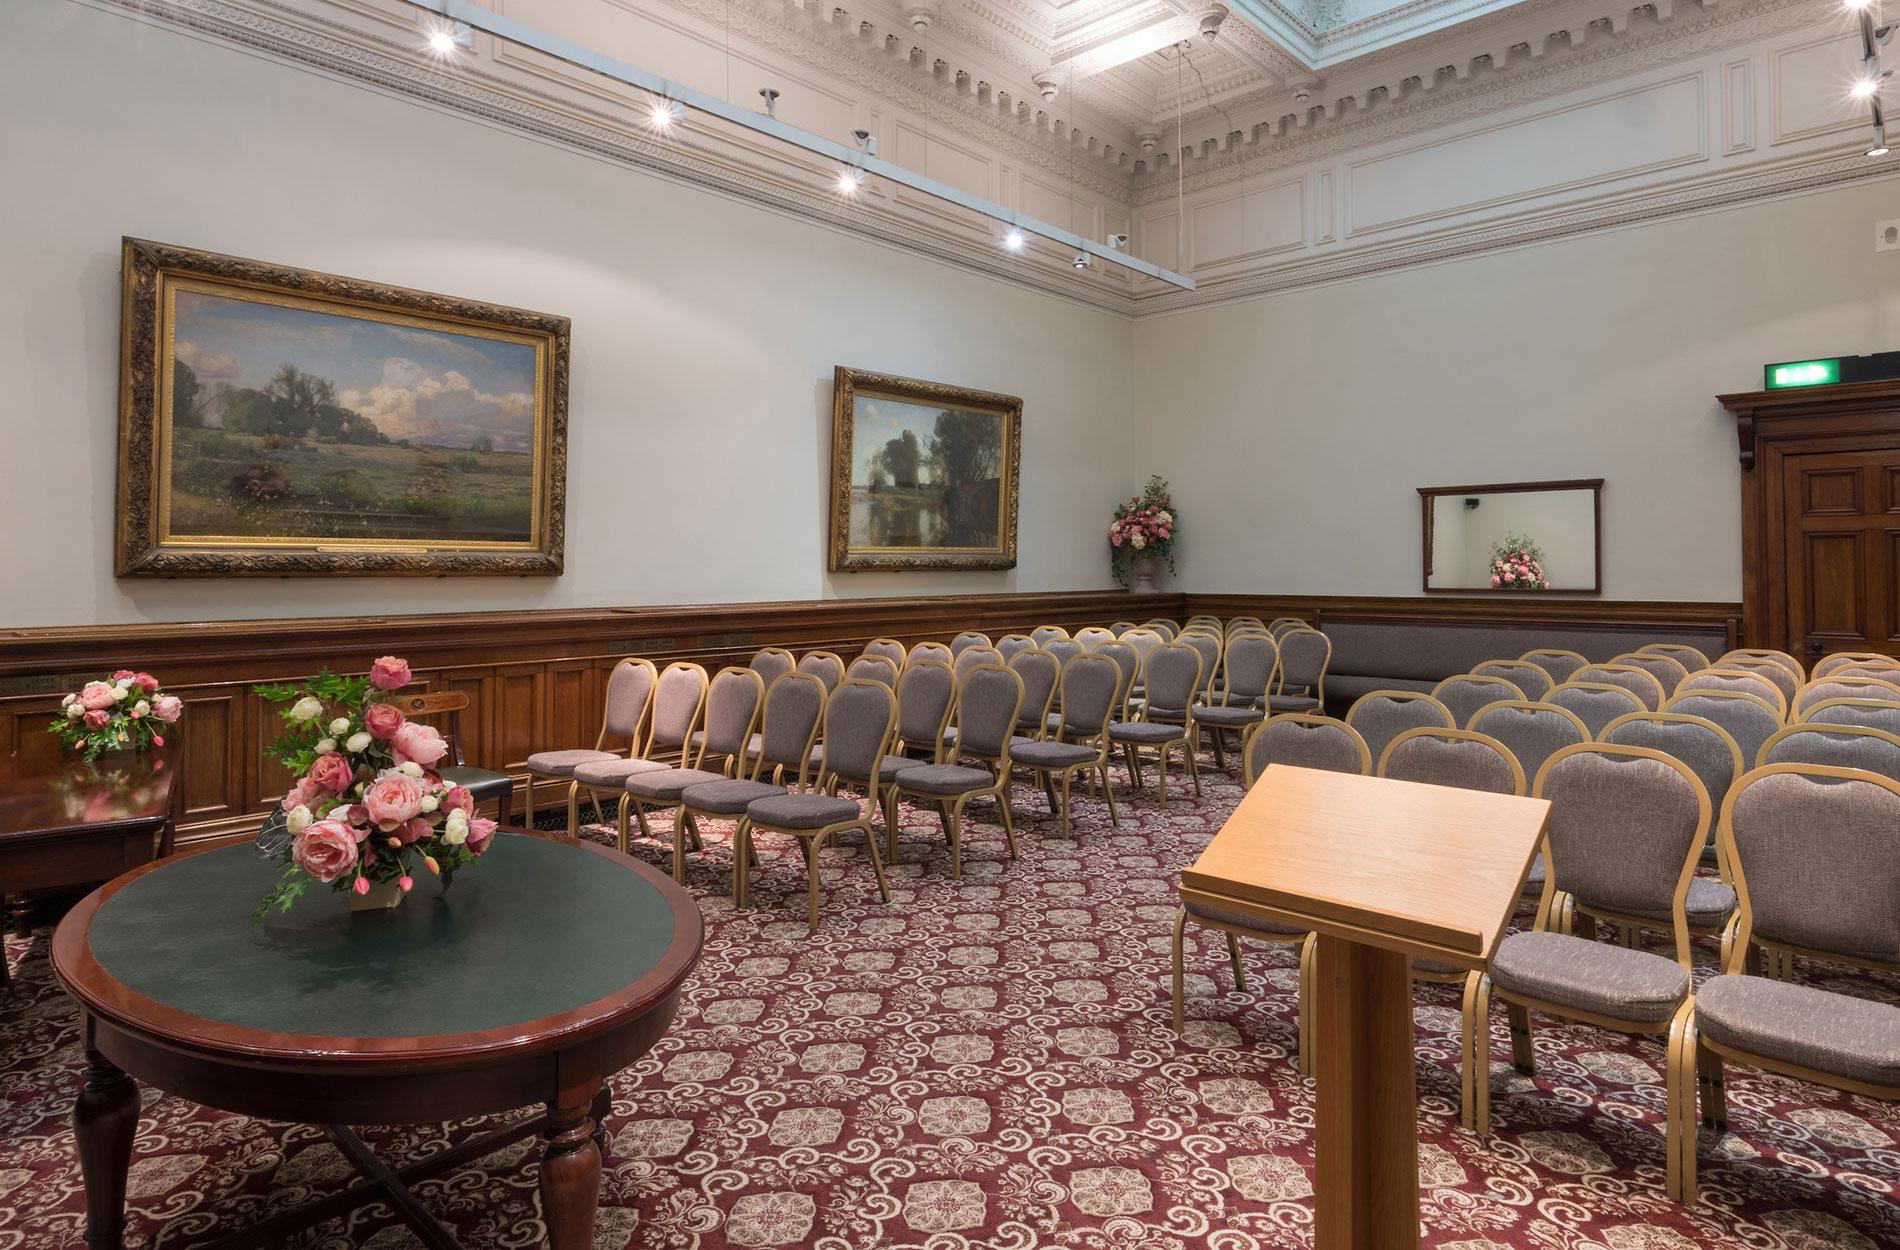 The Grand Jury room